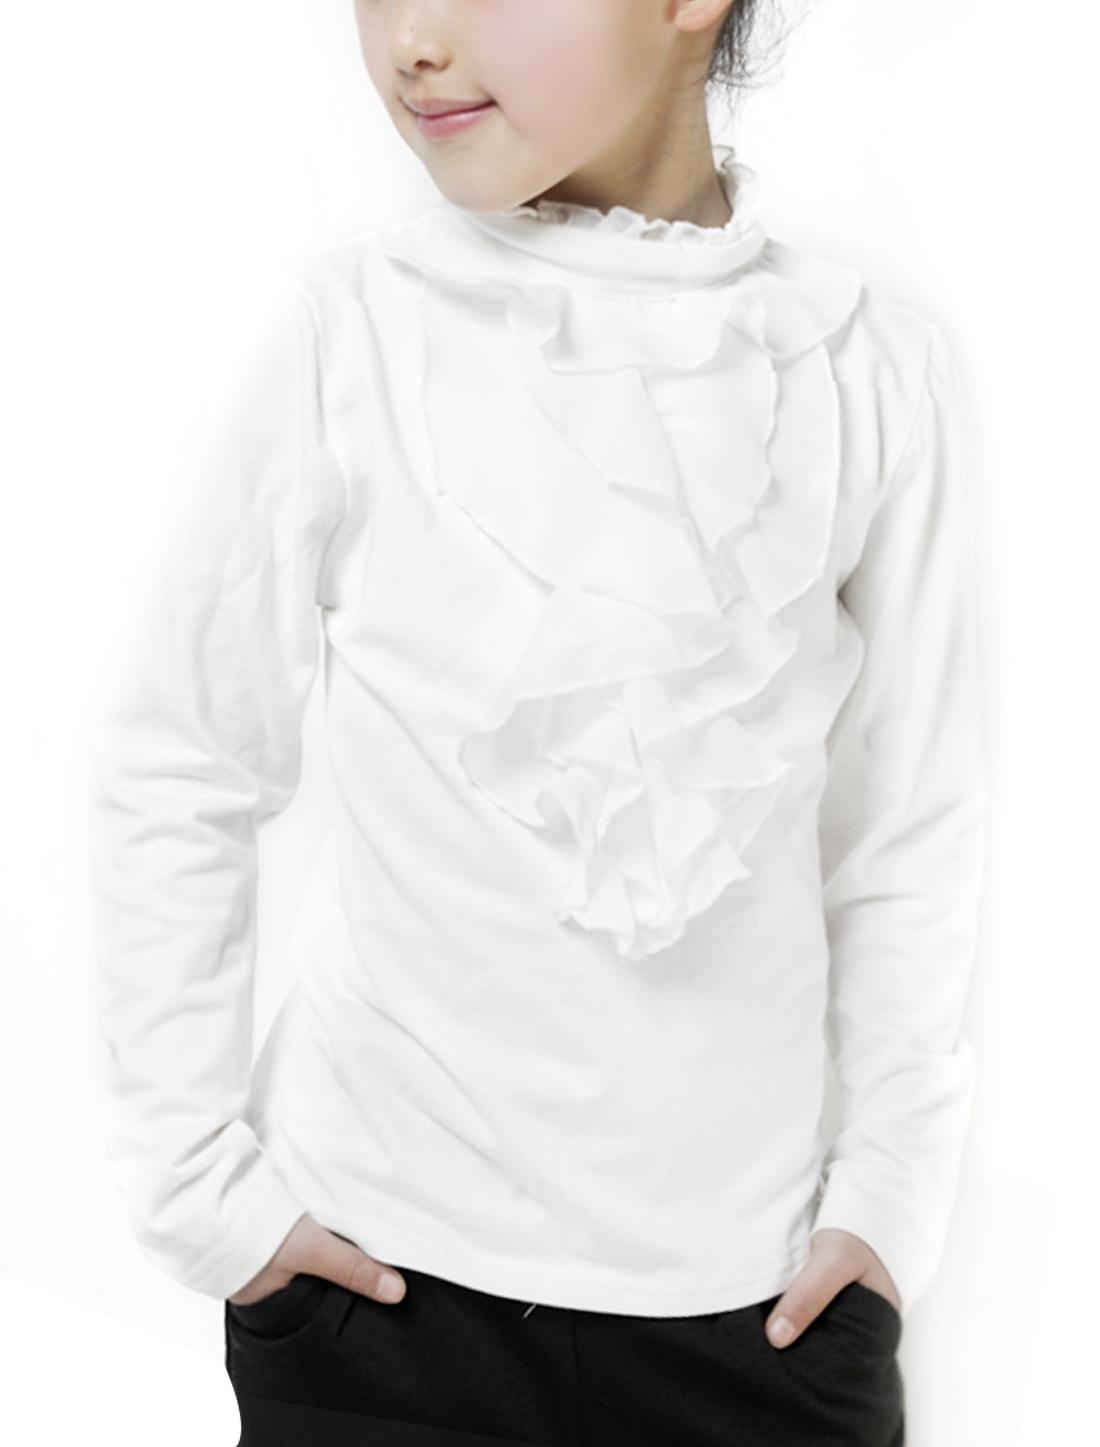 Girls Mock Neck Ruffled Detail Top Shirt White 3T